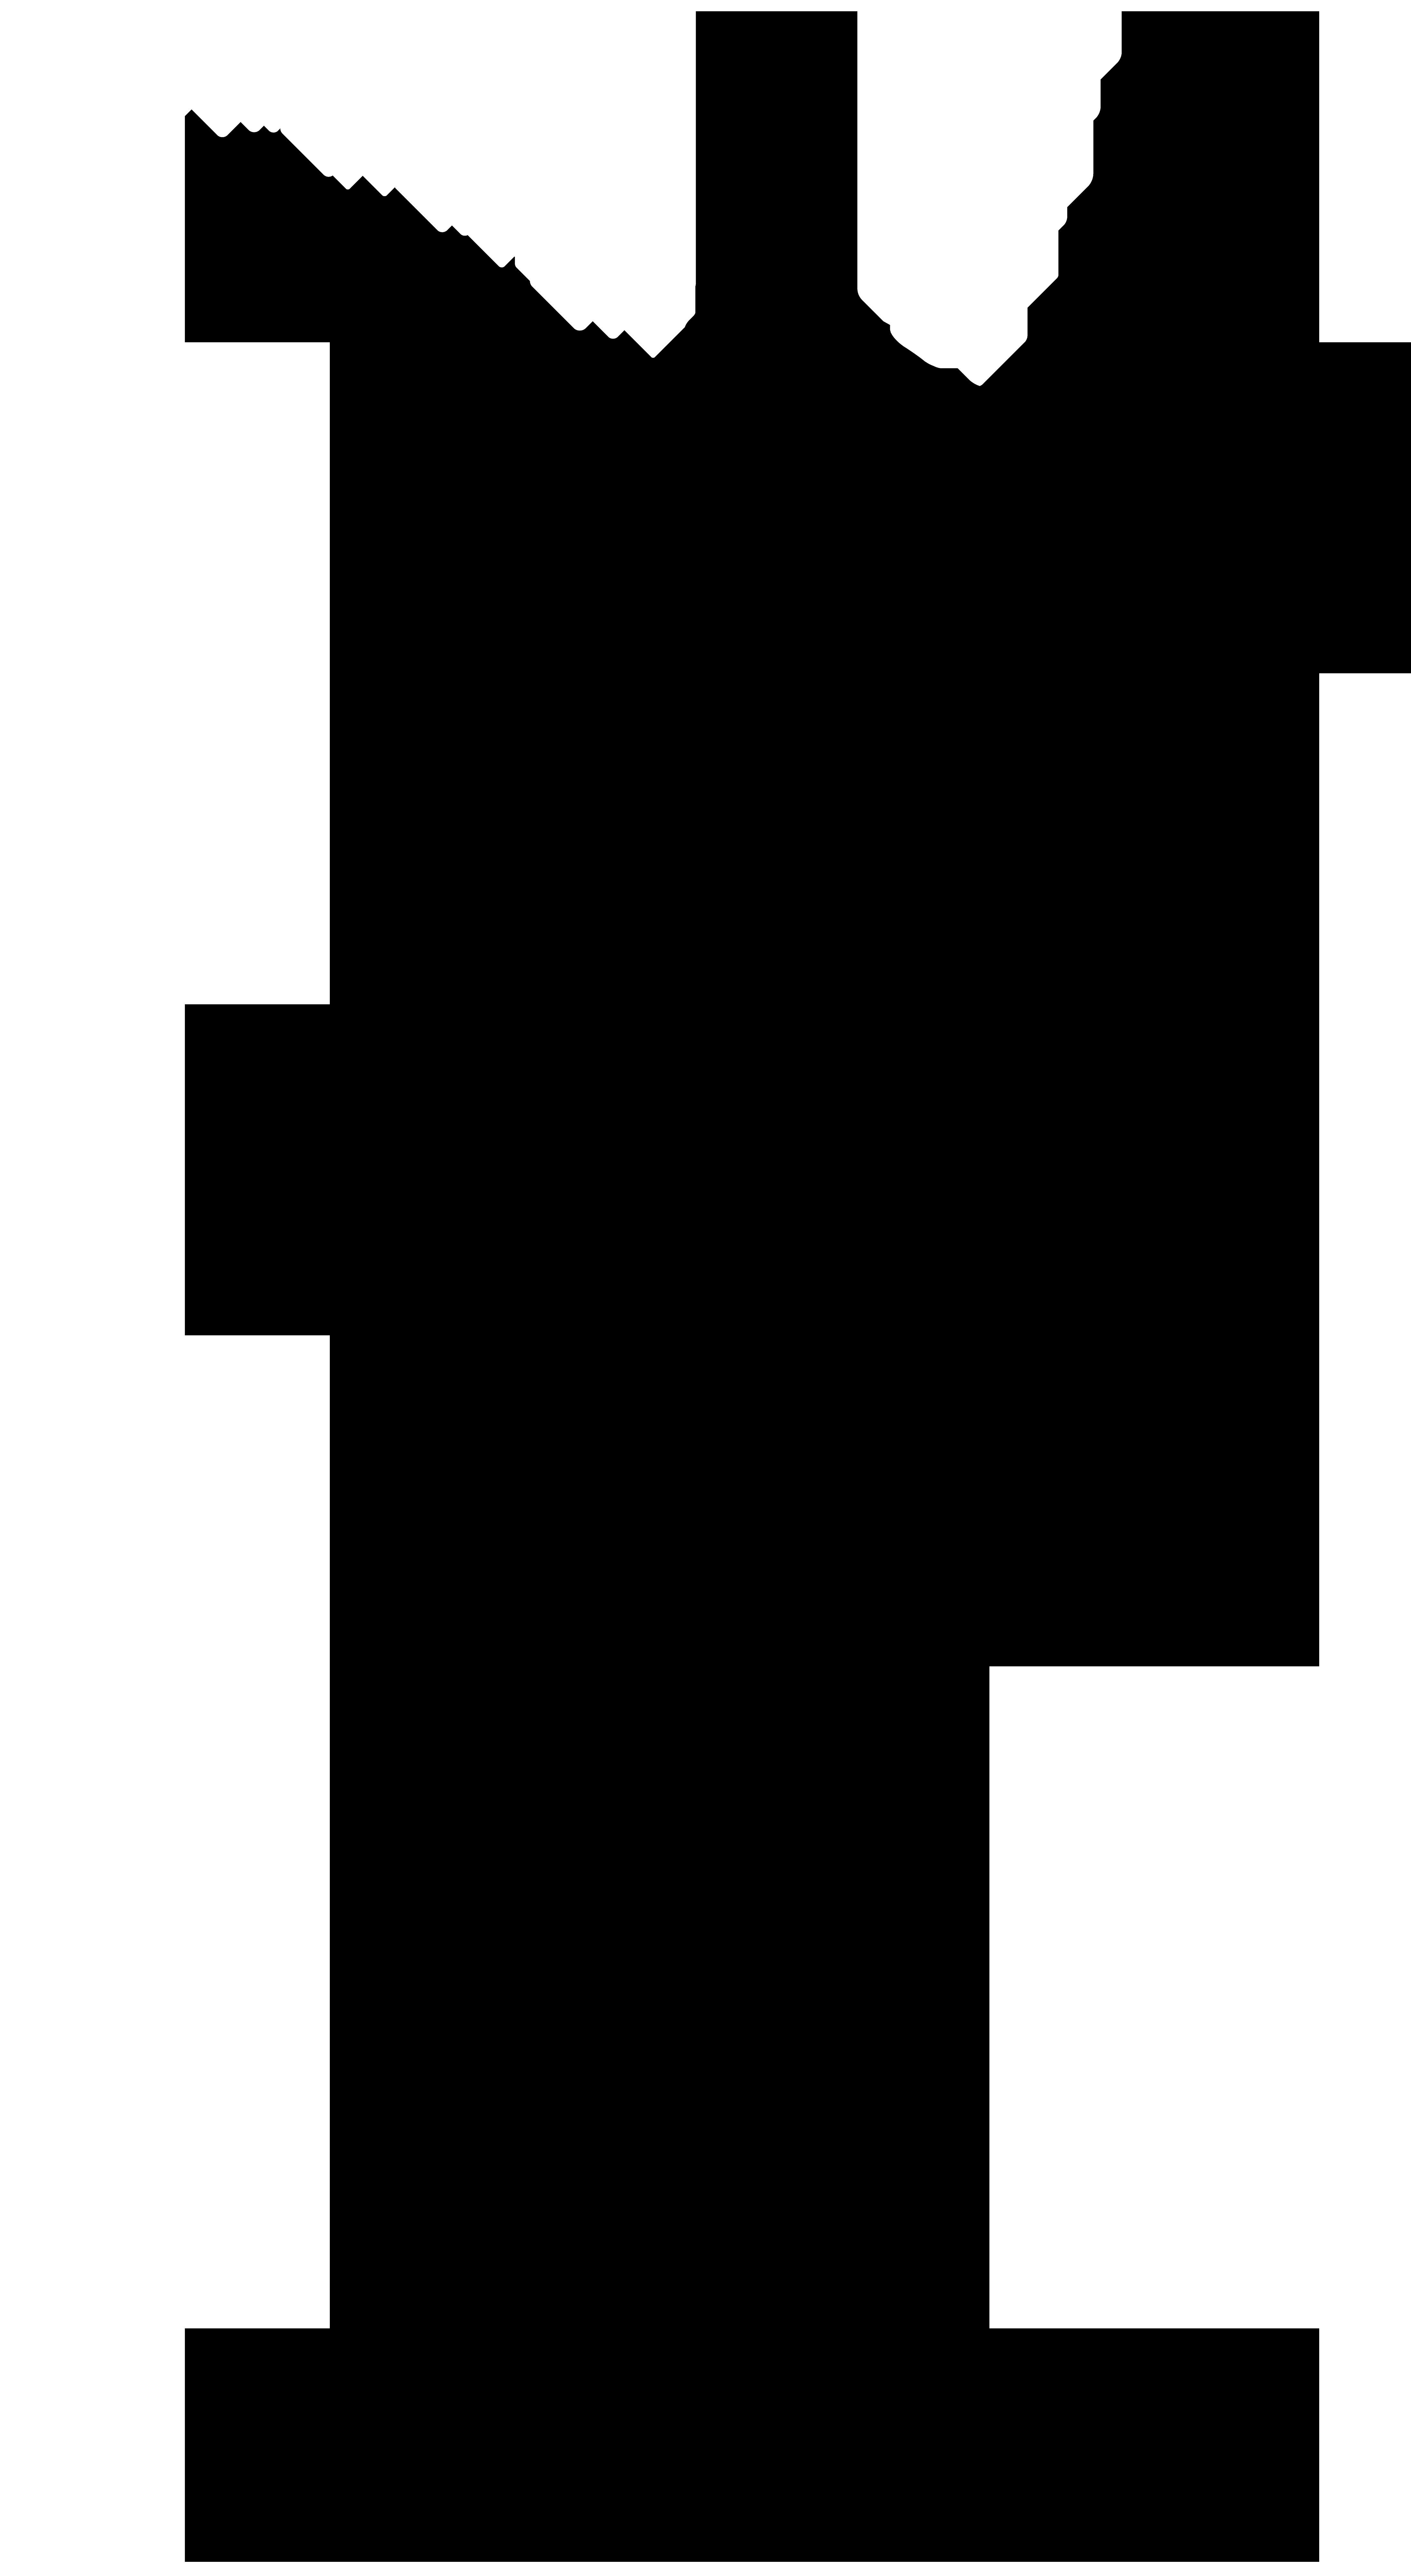 diver silhouette clipart 20 free cliparts